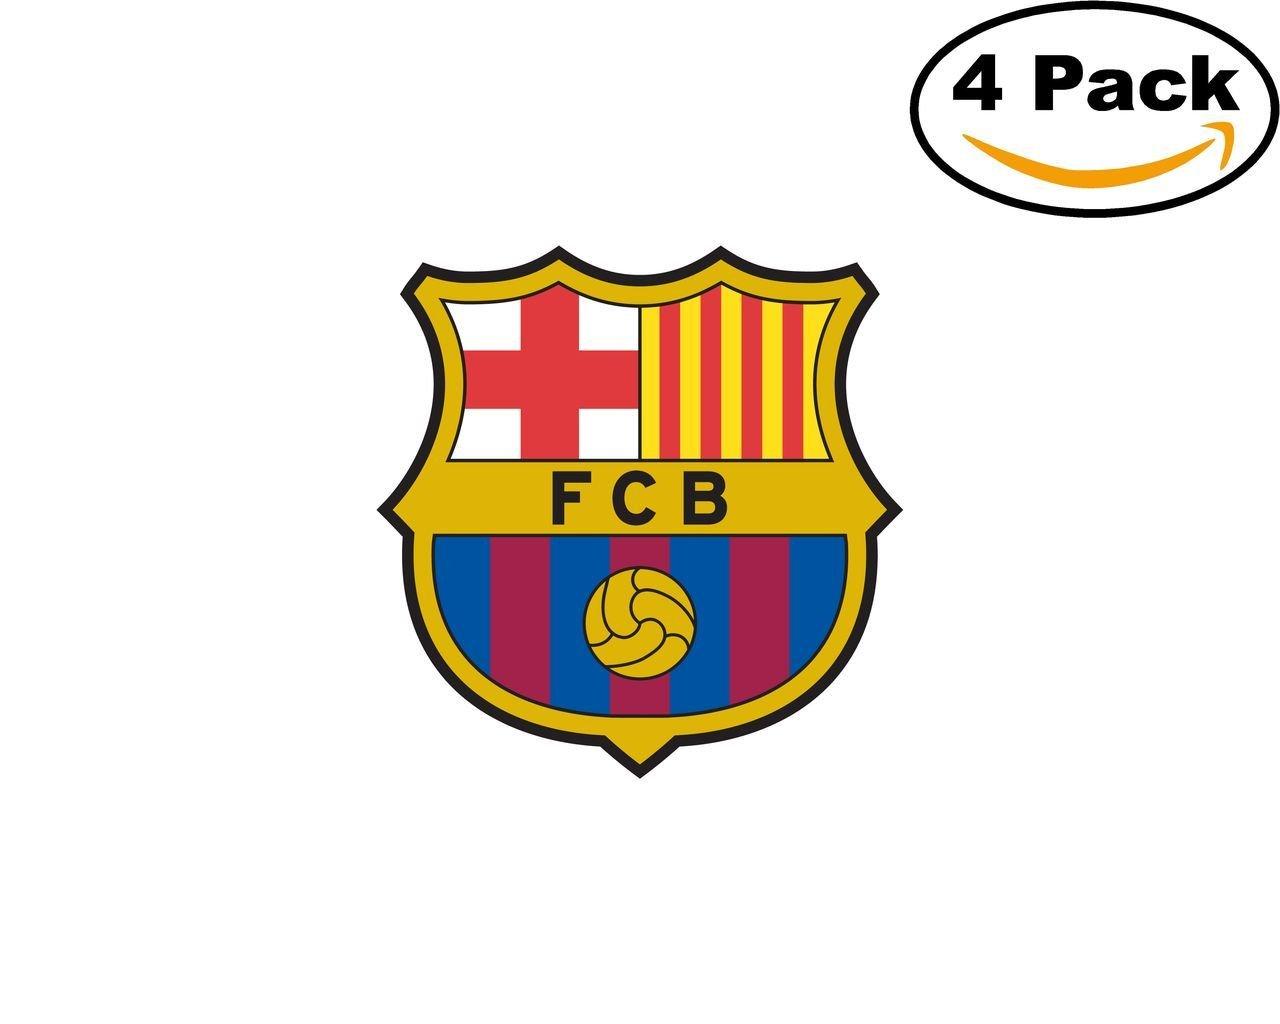 c42f65d20 Get Quotations · FC Barcelona 1 Spain Football Club Soccer FC 4 Sticker  Decal 4X4